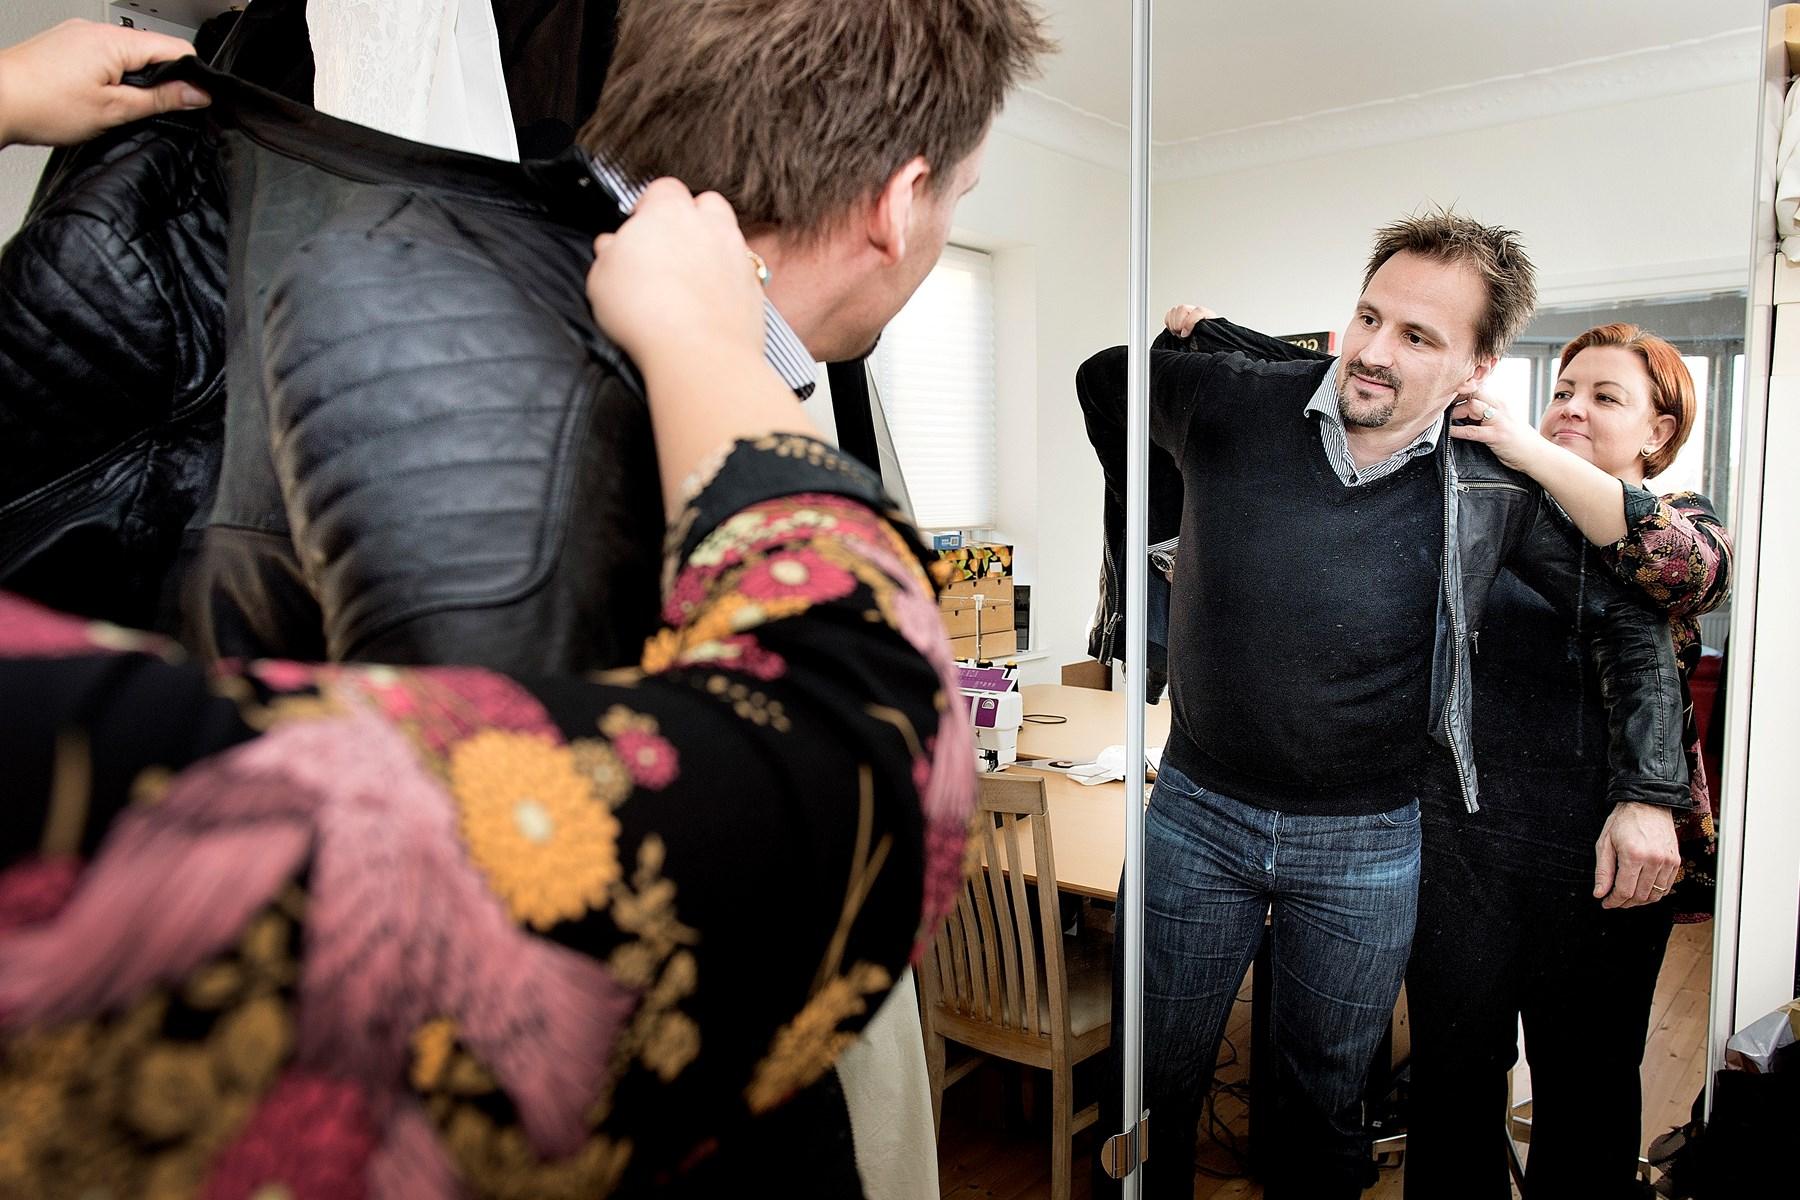 Aalborgfirma kåret som bedst for verden